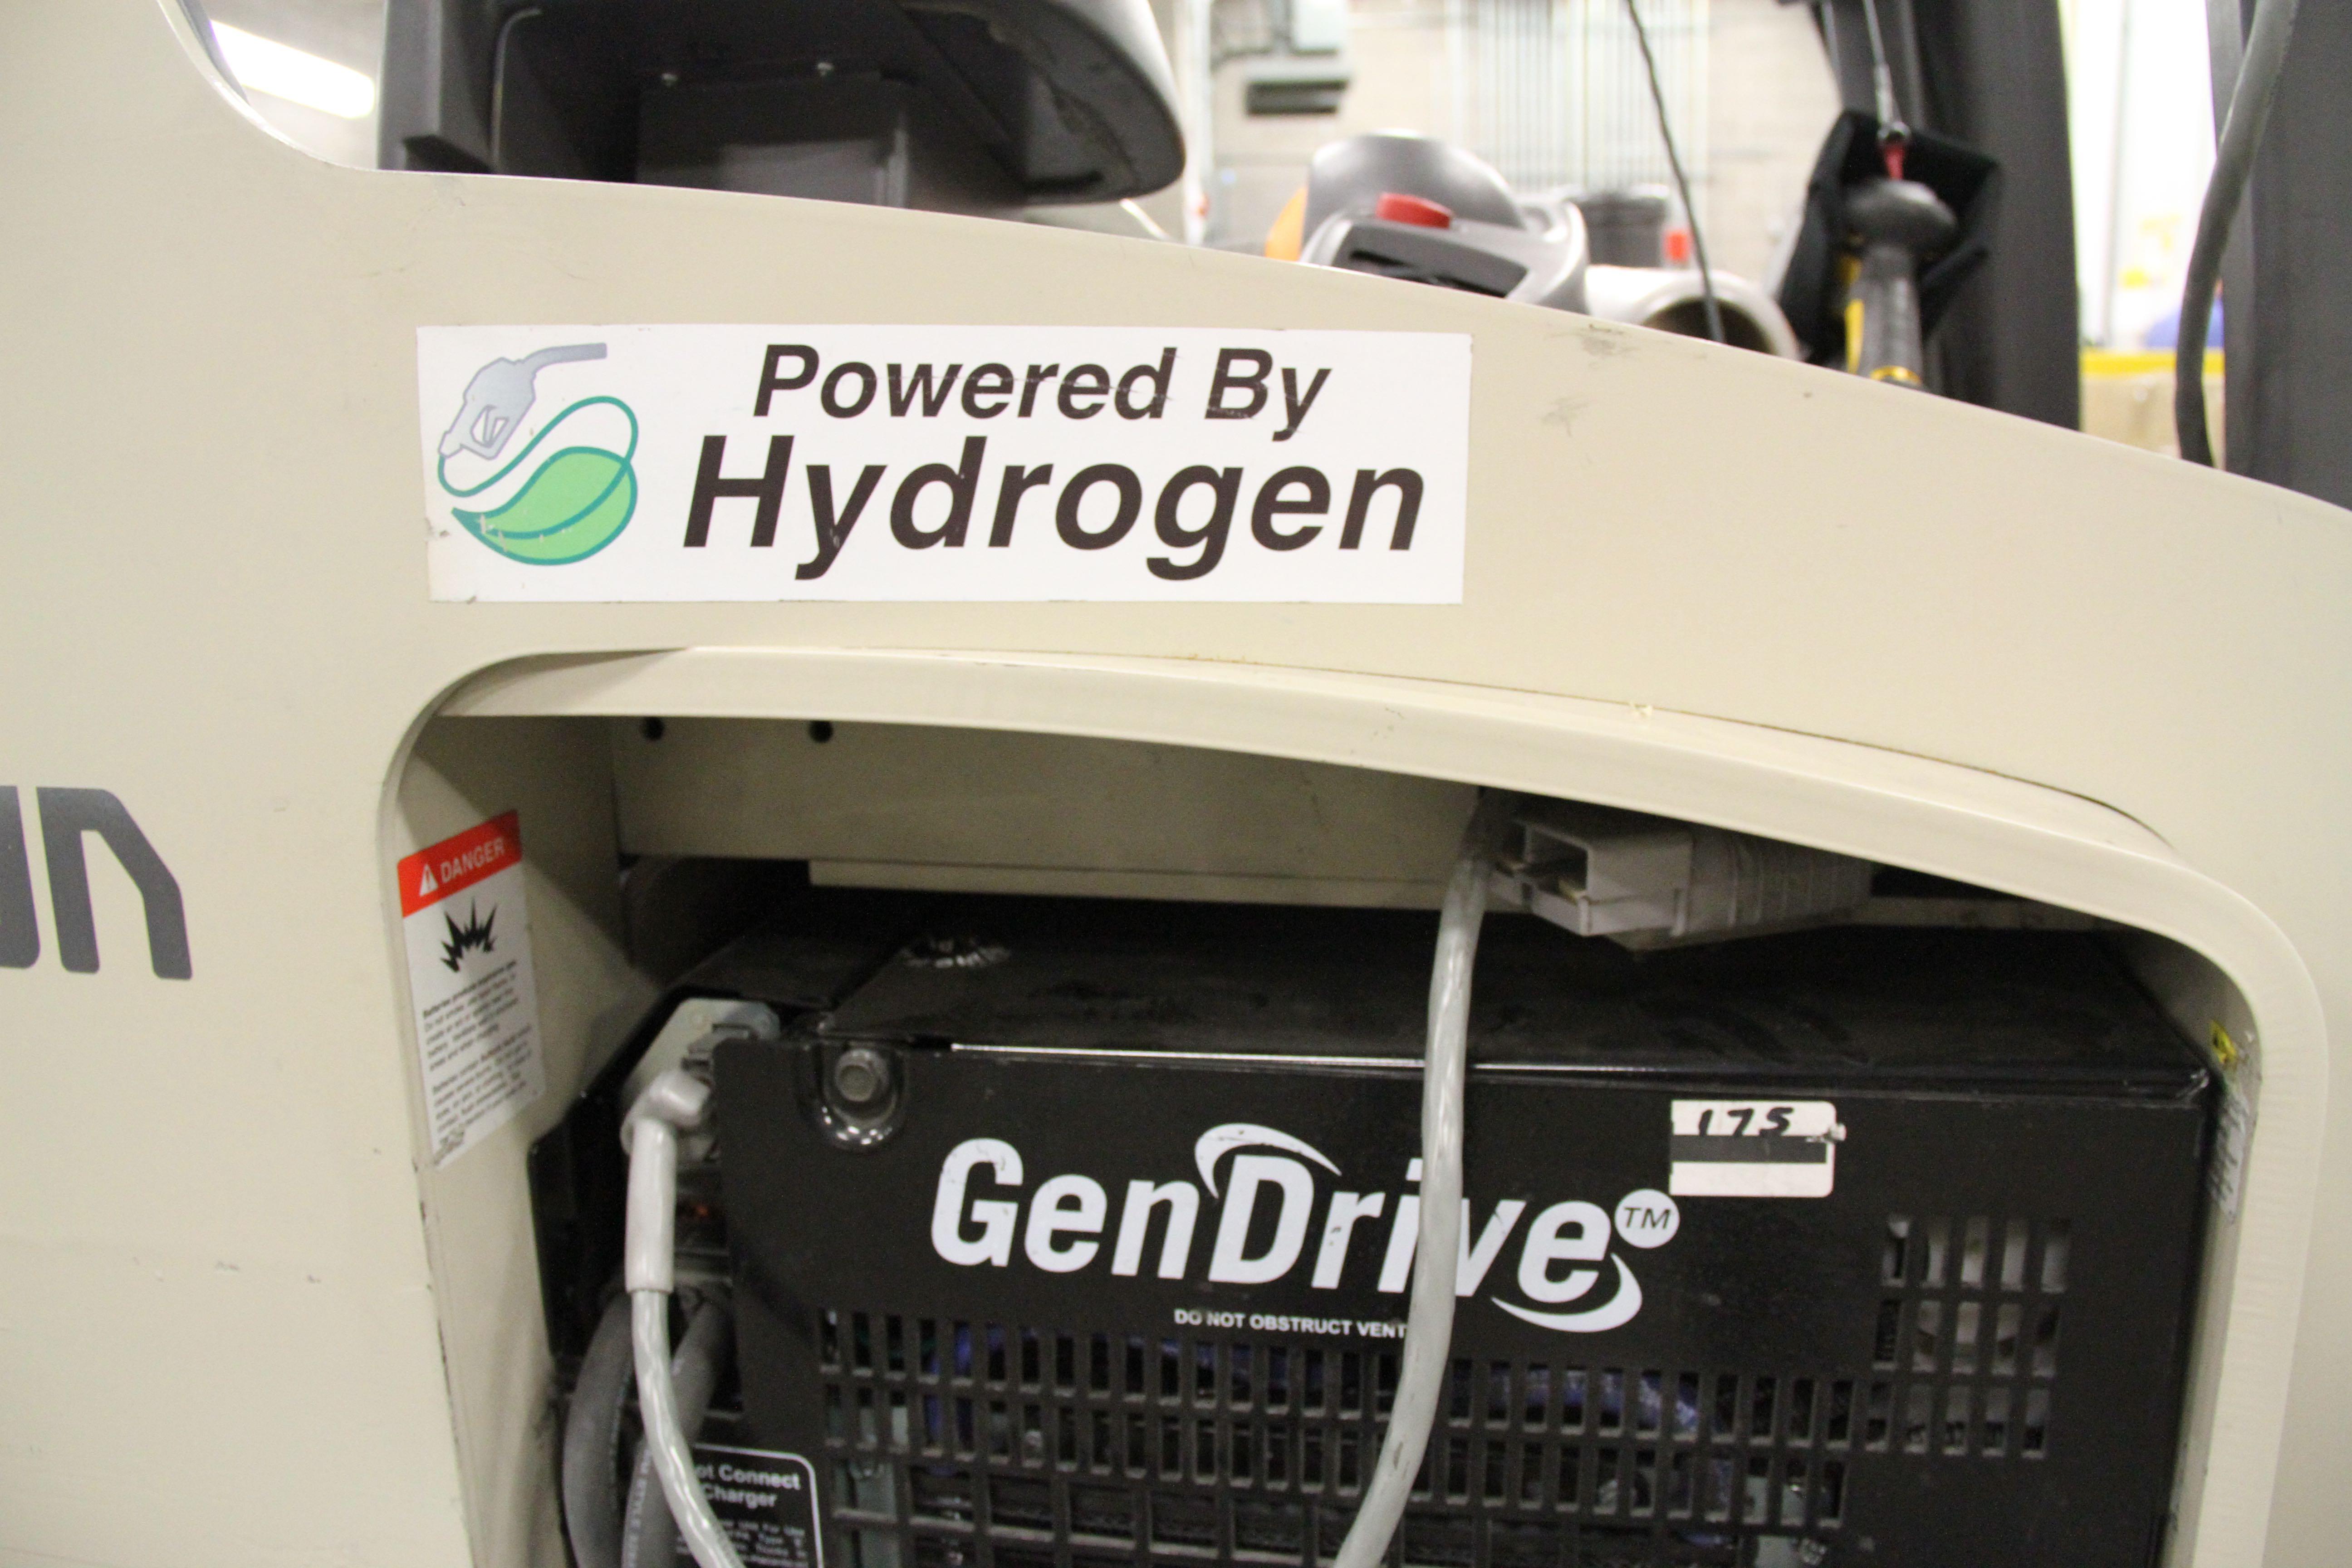 Powered by hydrogen sticker on a Walmart-SCM forklift